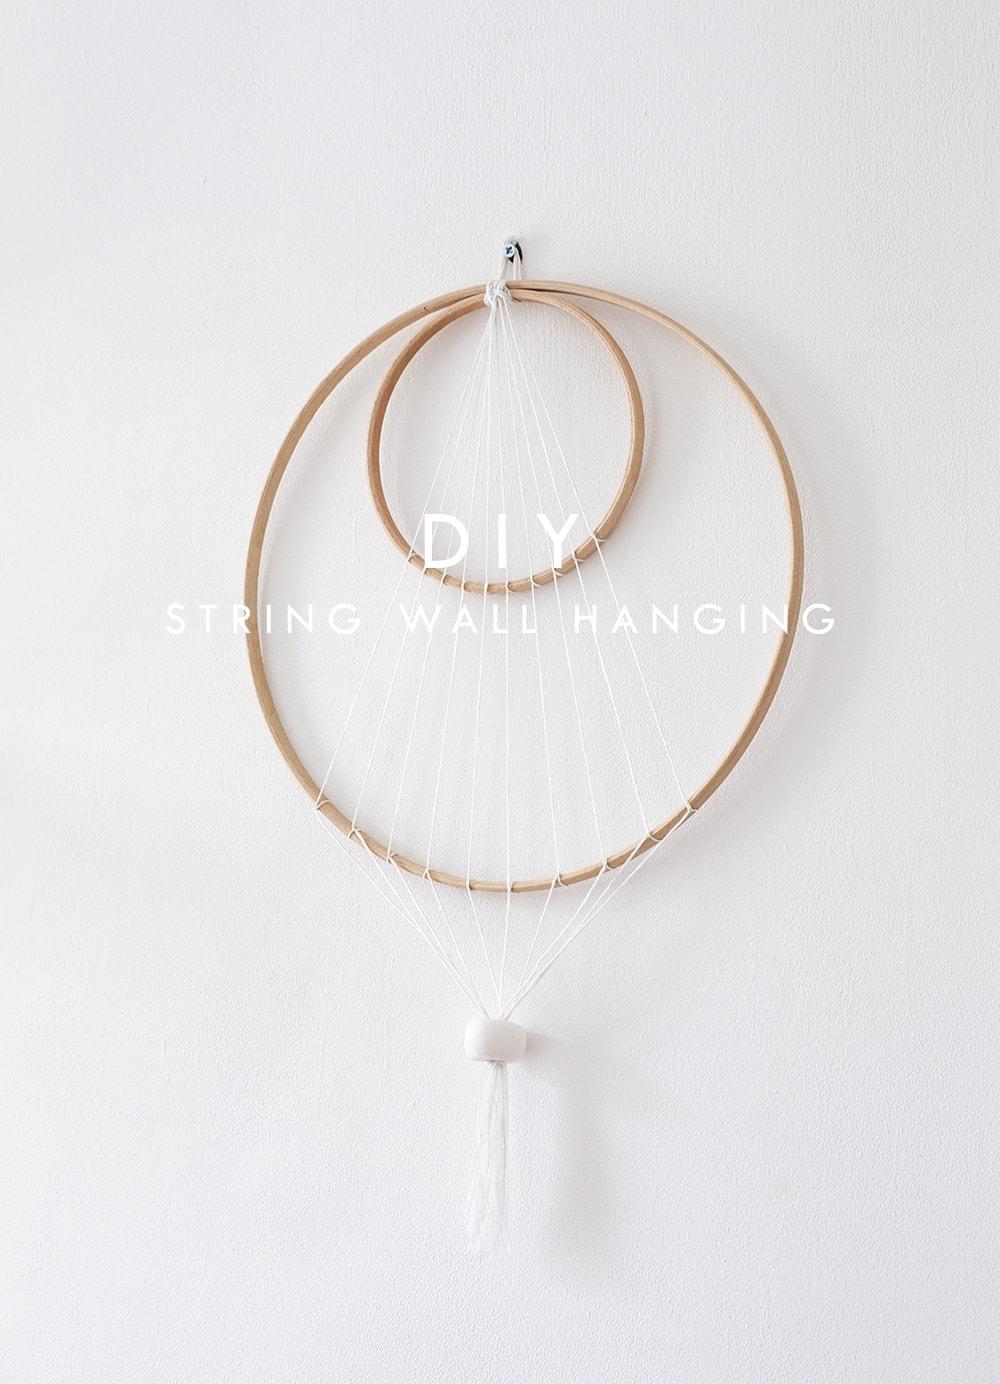 string wall hanging